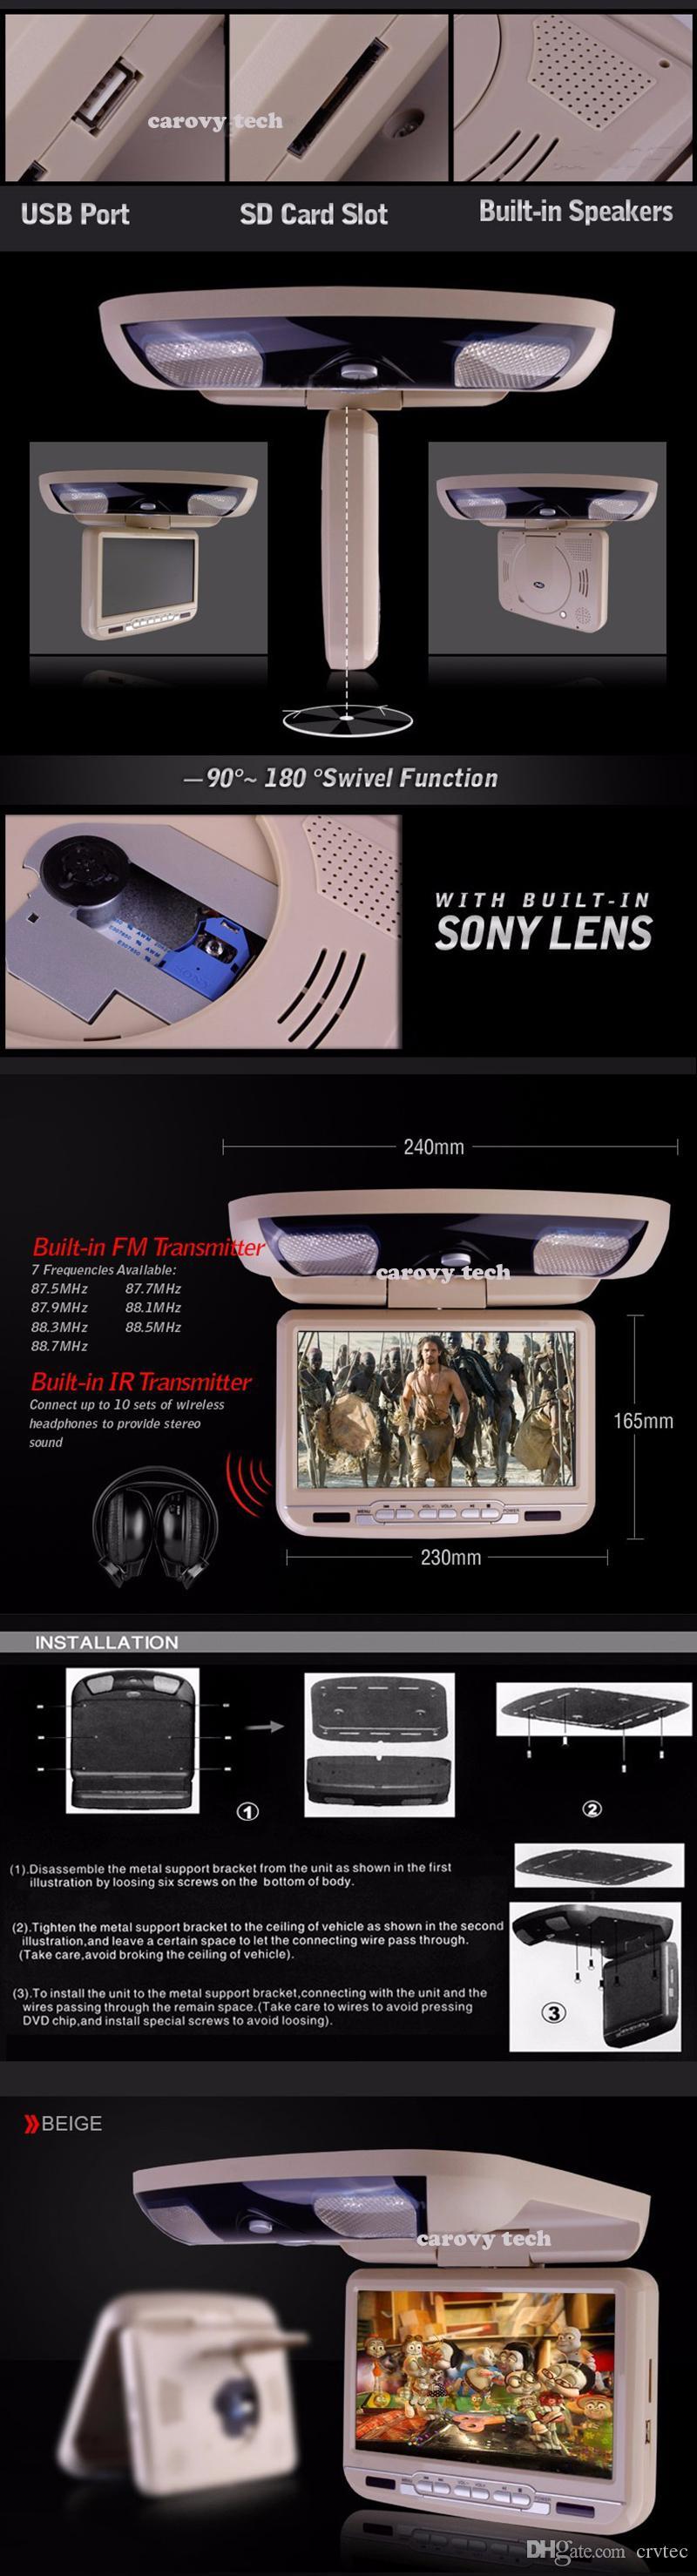 9 inch Flip Down Dvd 800x480 Swivel screen monitor roof mount car dvd player USB SD FM IR Transmitter Game beige grey black